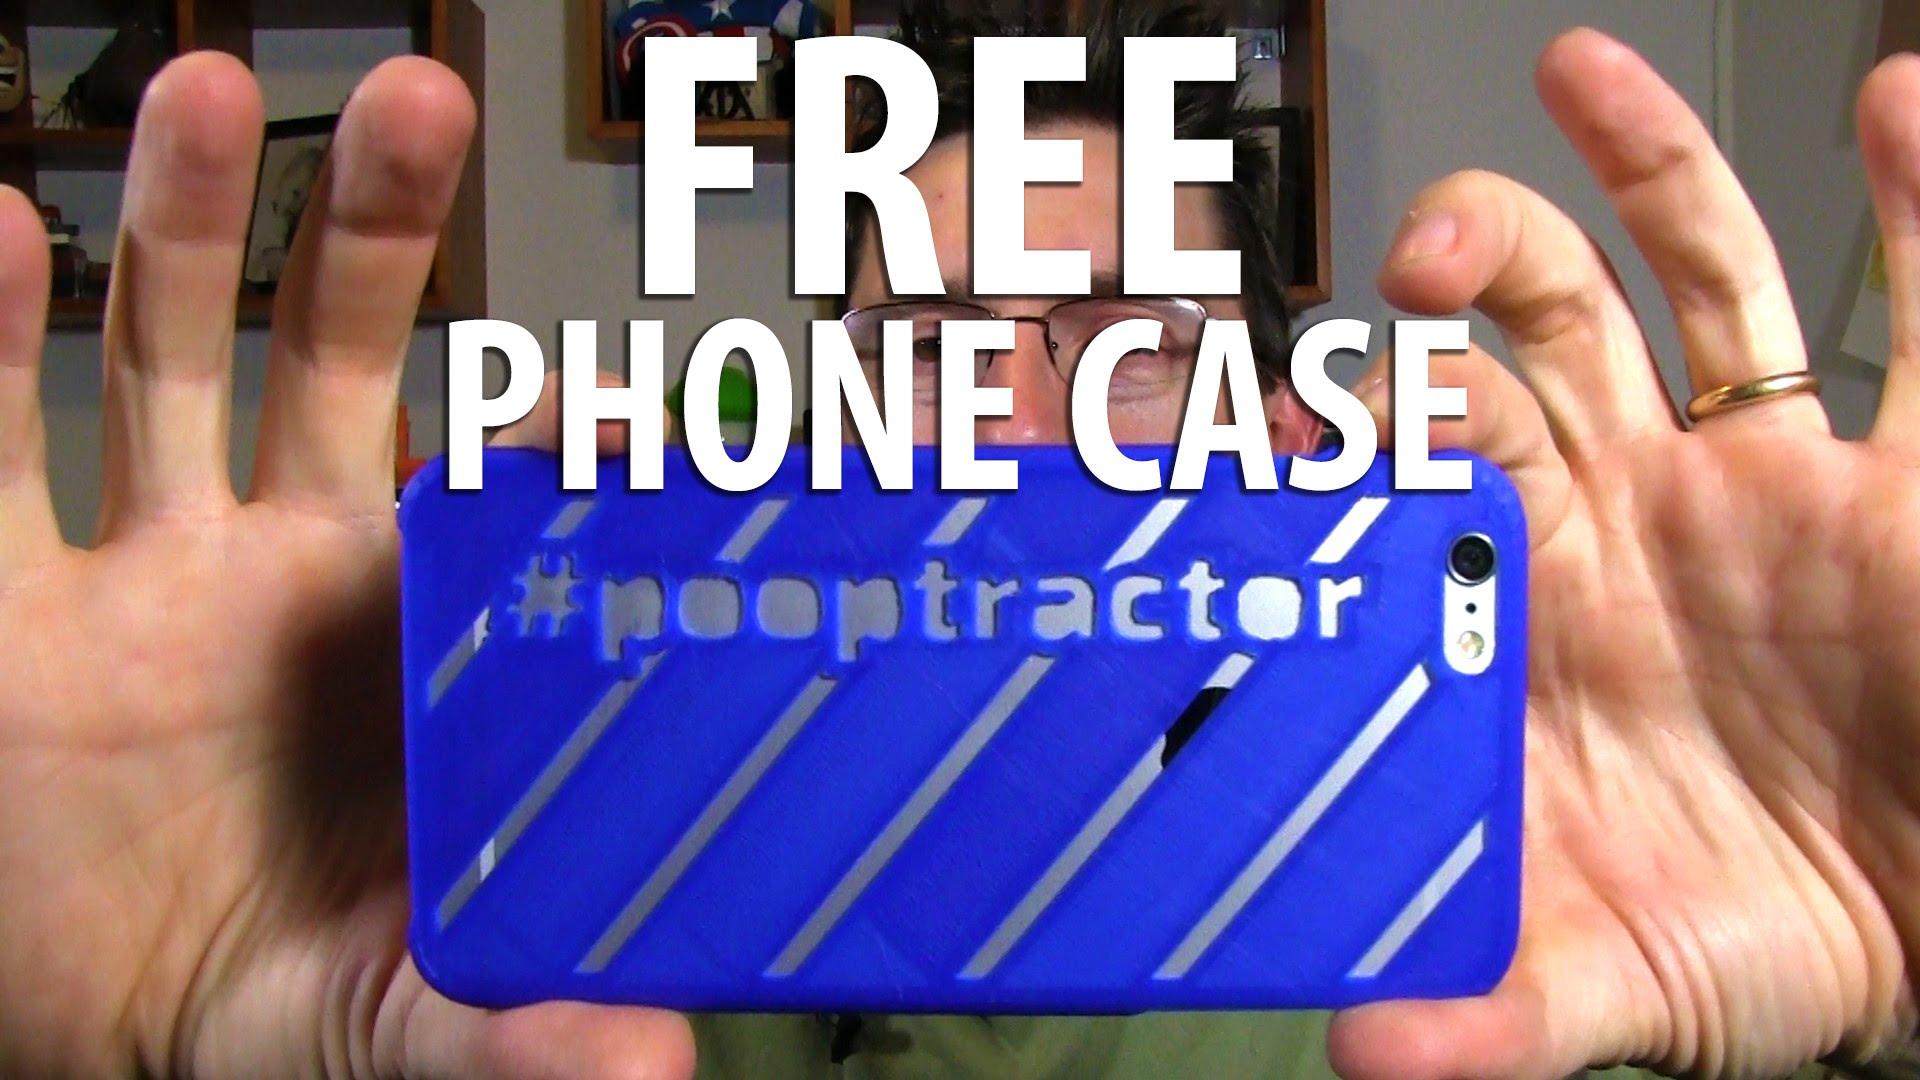 3D Print a Custom Free Phone Case